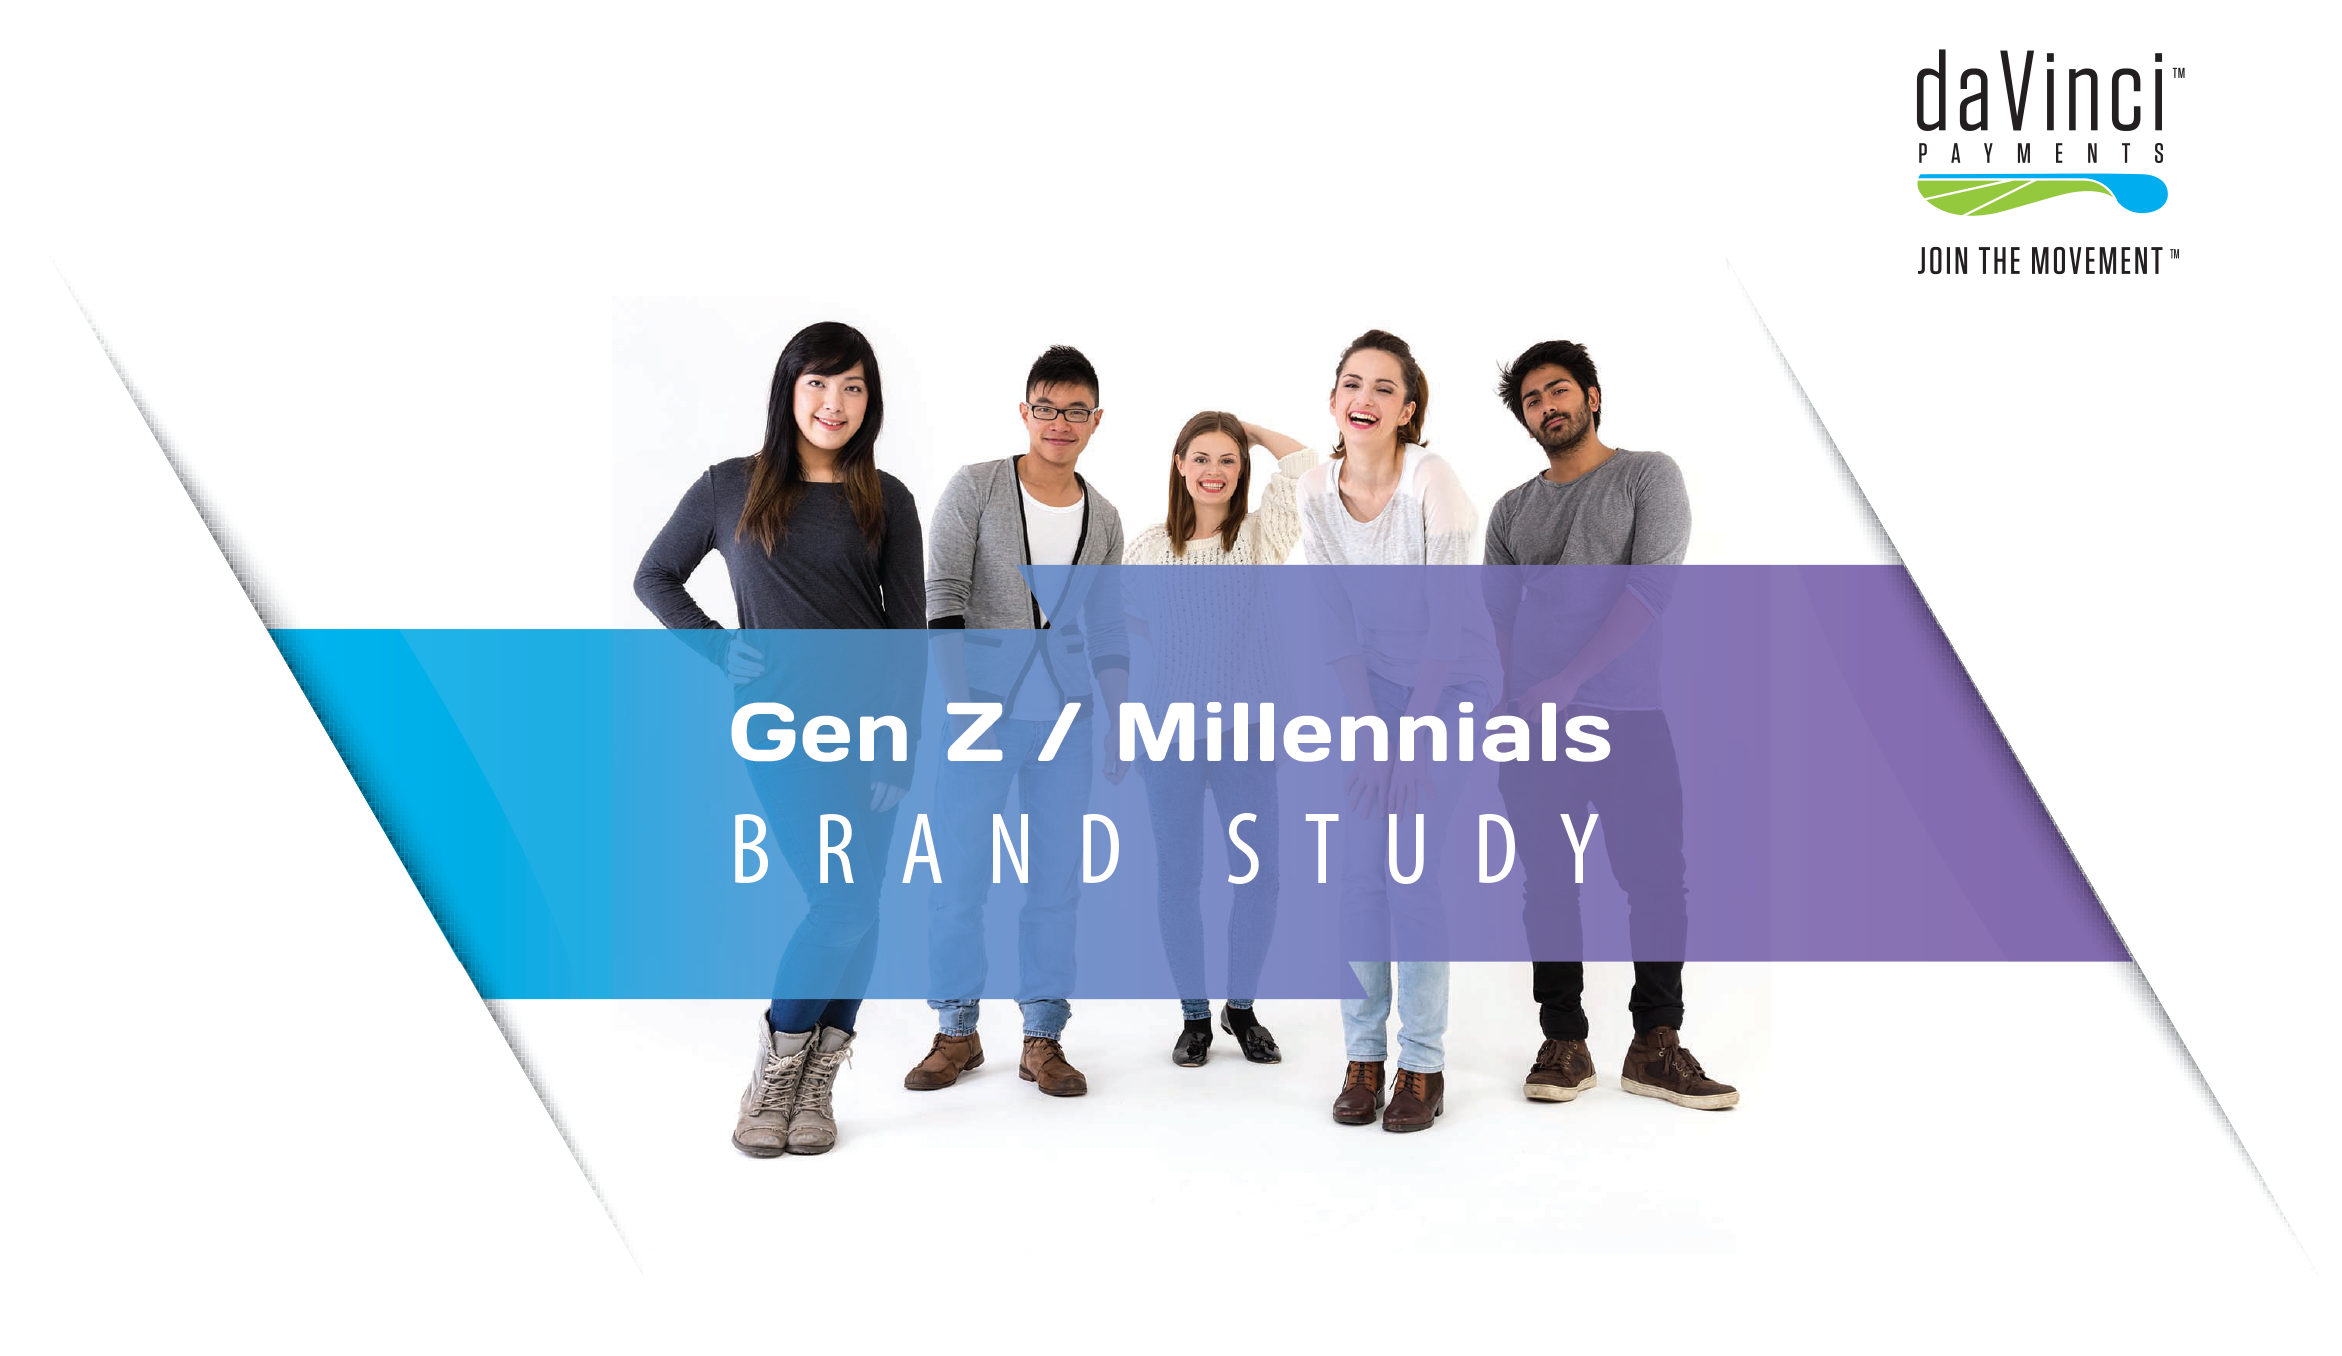 daVinci GenZ Millennial Brand Study 1 v2